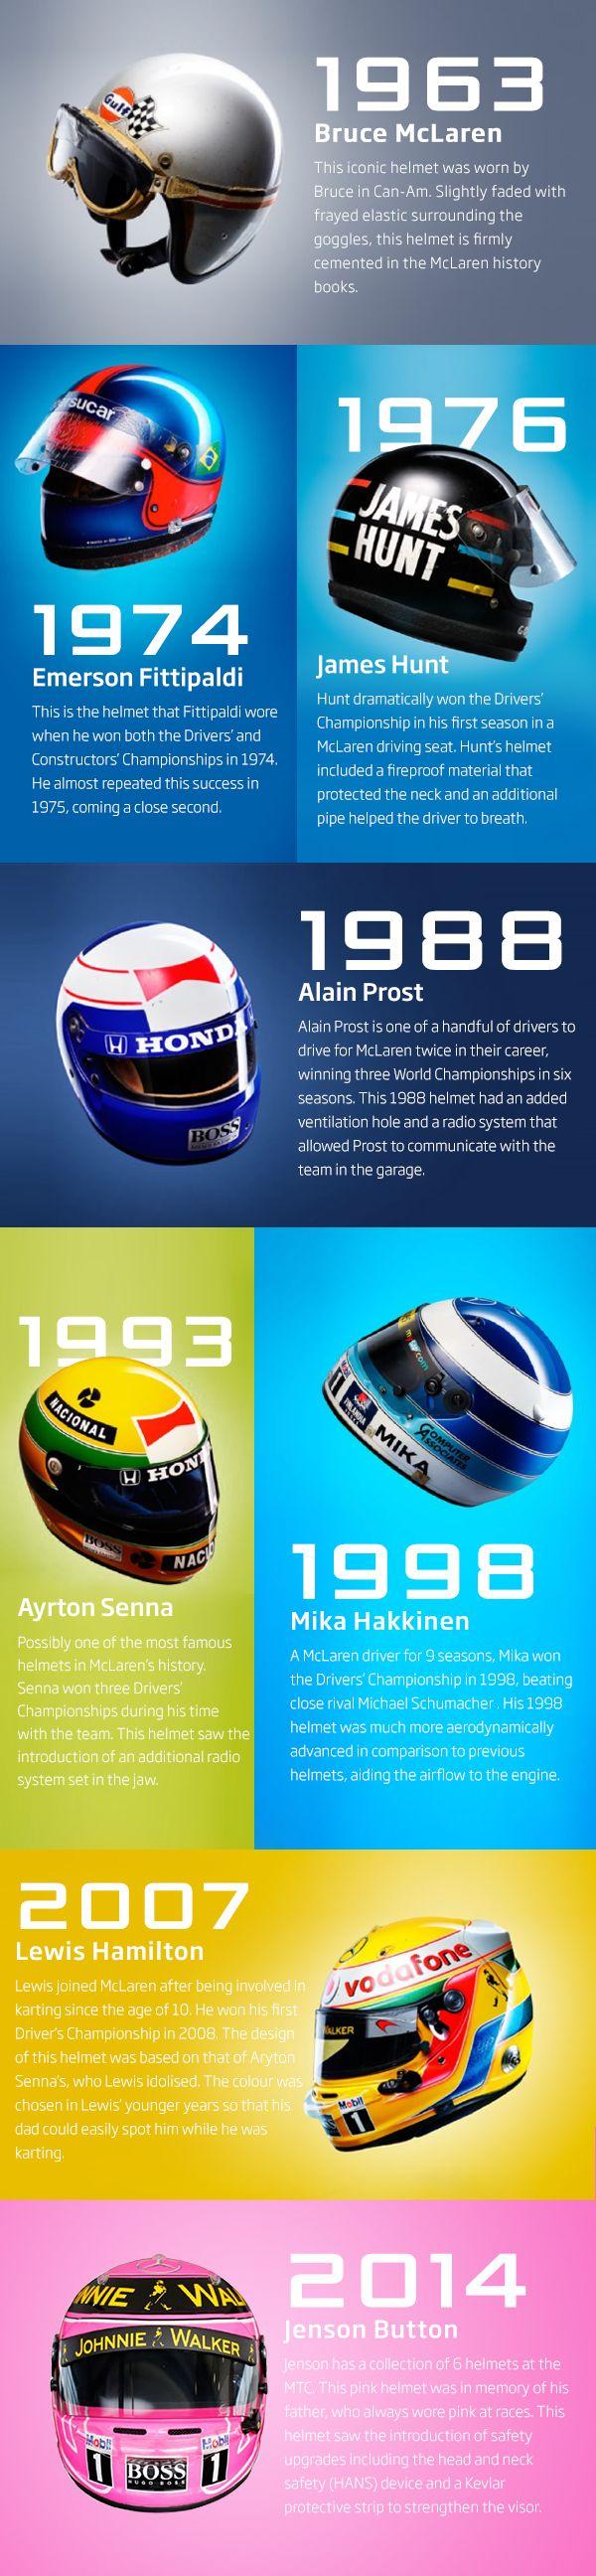 A history of iconic McLaren helmets.  www.mad4bikesuk.co.uk #mad4bikesuk